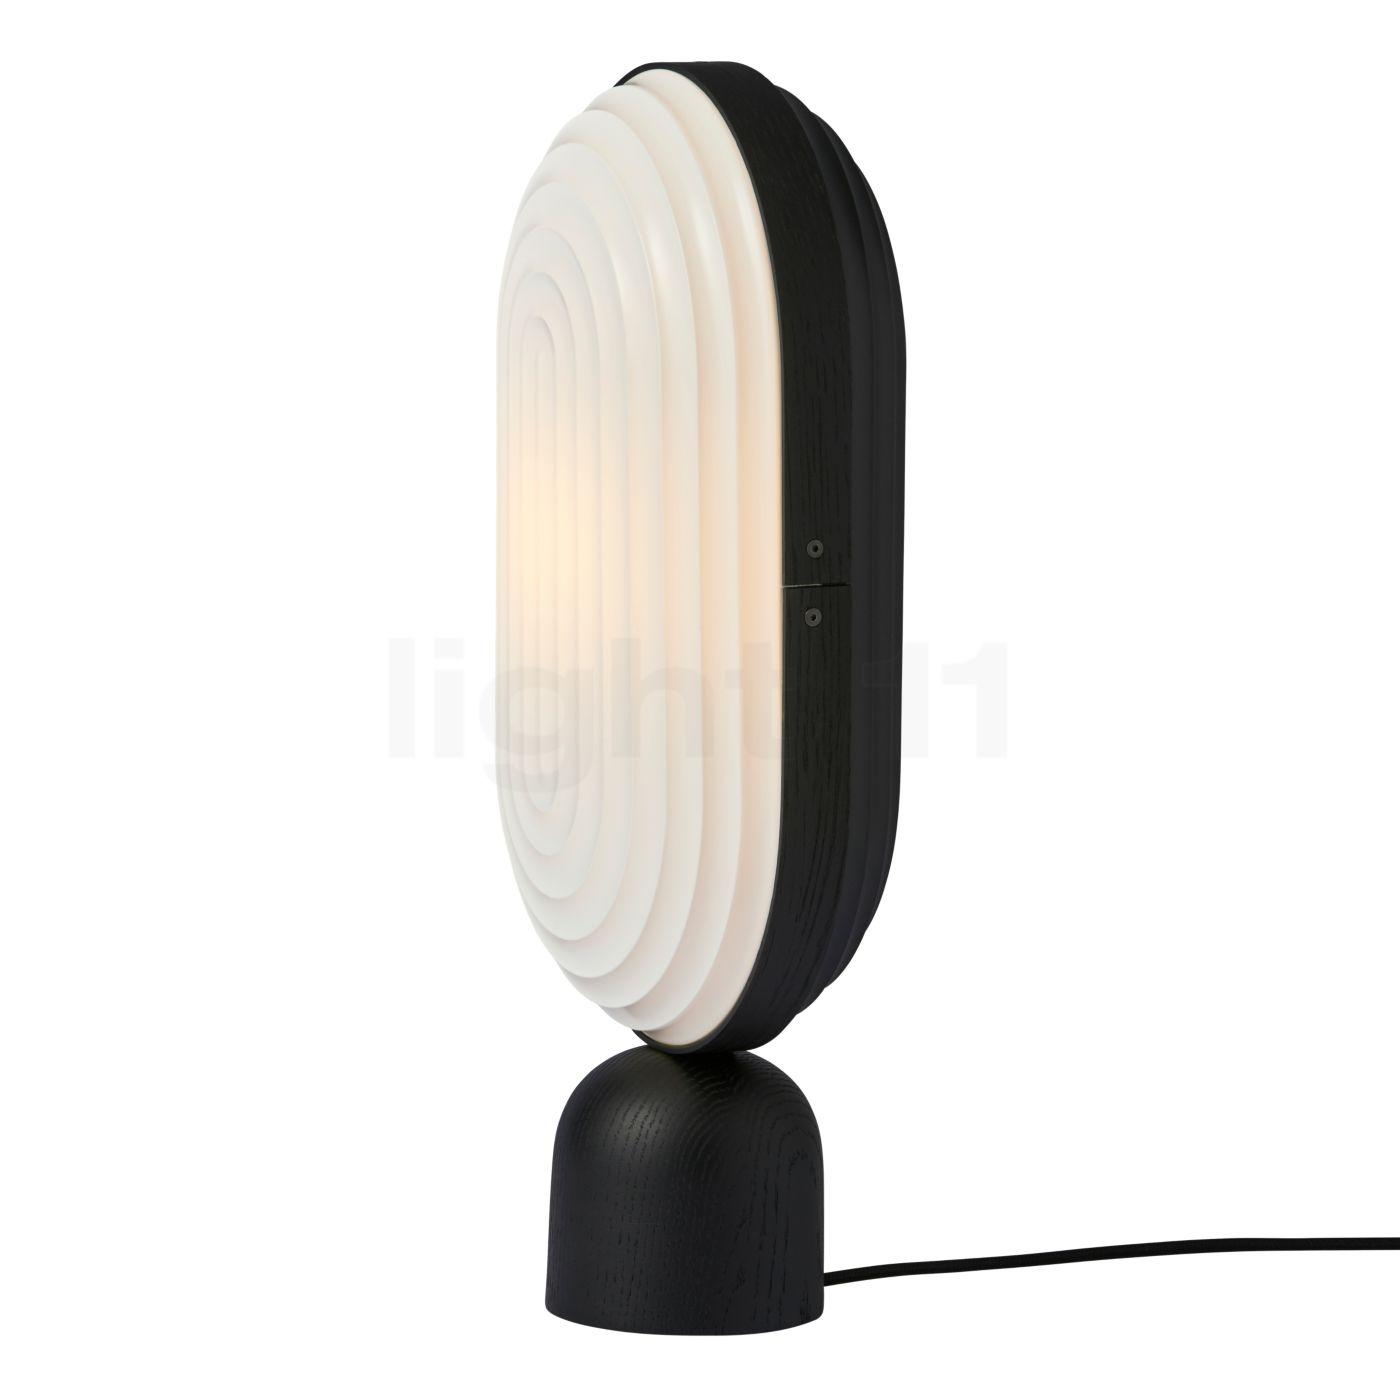 Design Lights U0026 Designer Lamps Light11.eu